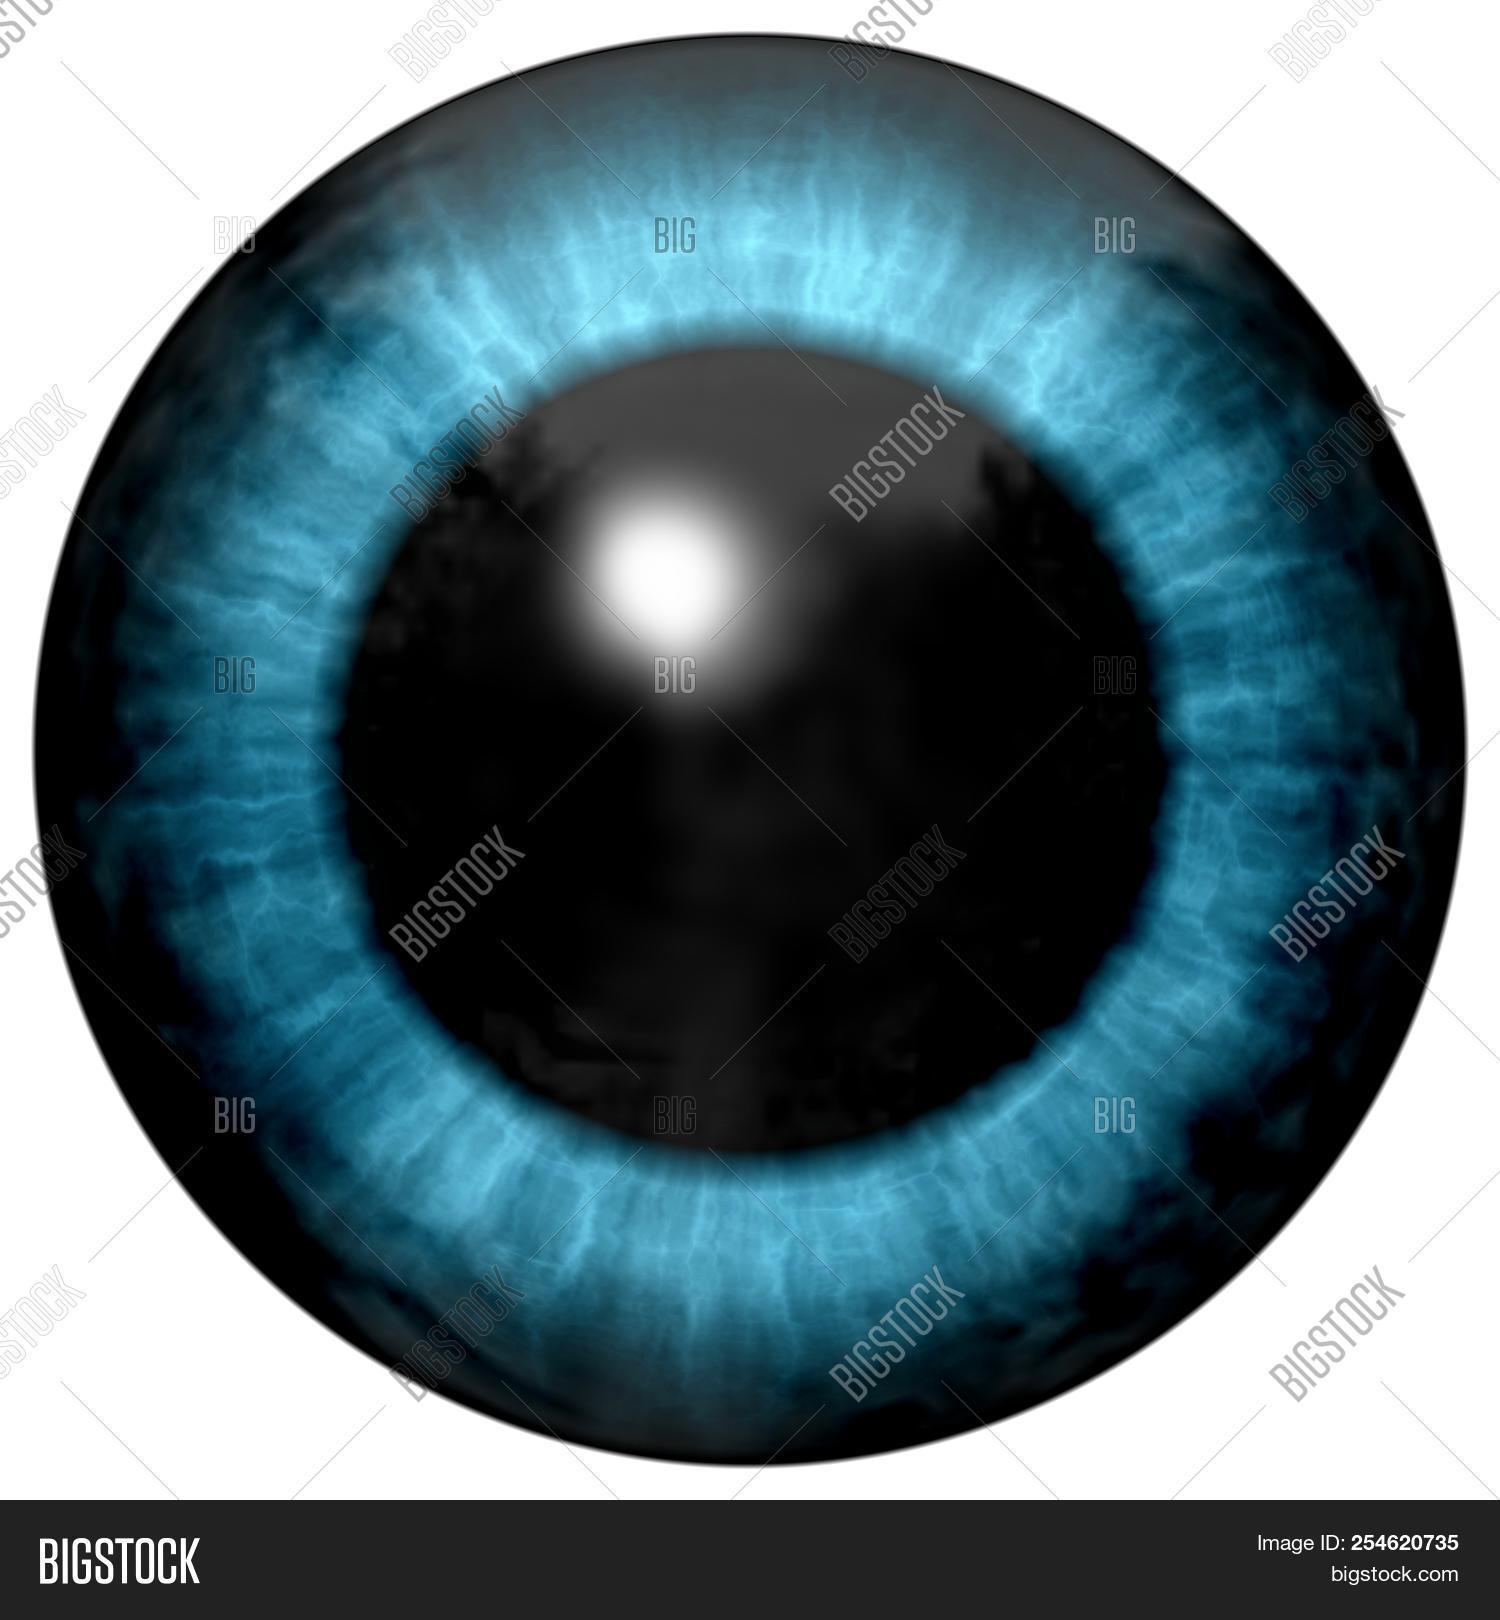 Beautiful Blue Eyes Image Photo Free Trial Bigstock